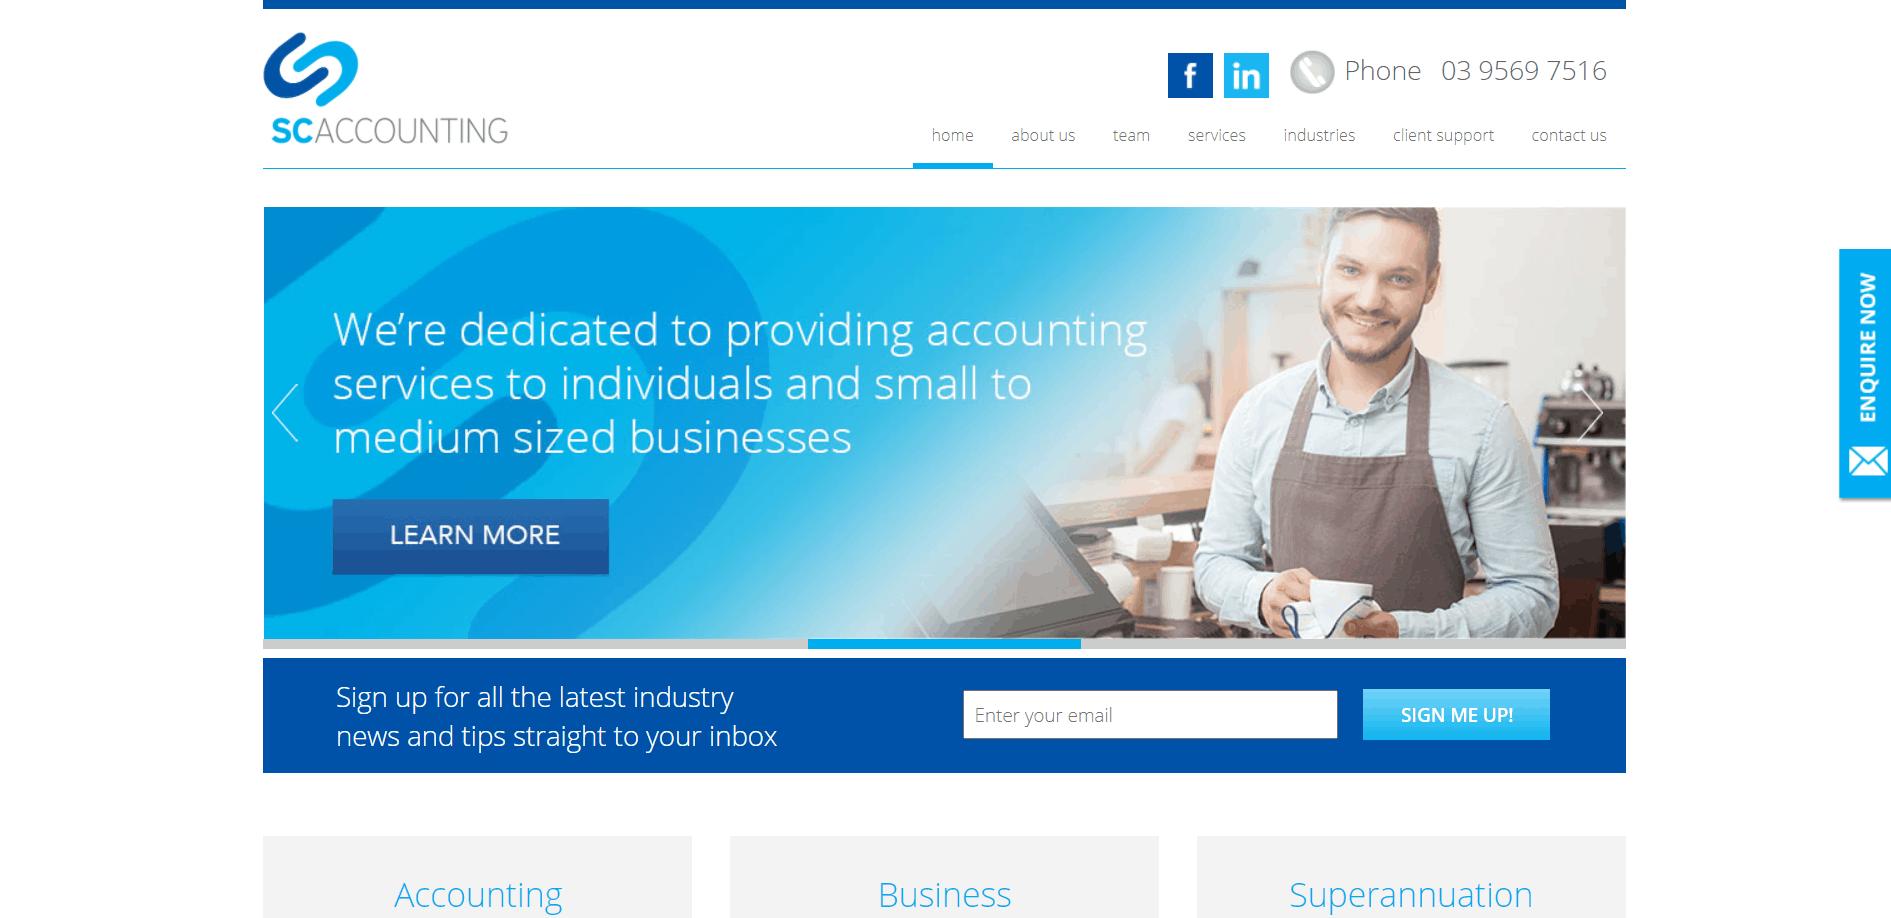 Sc Accounting